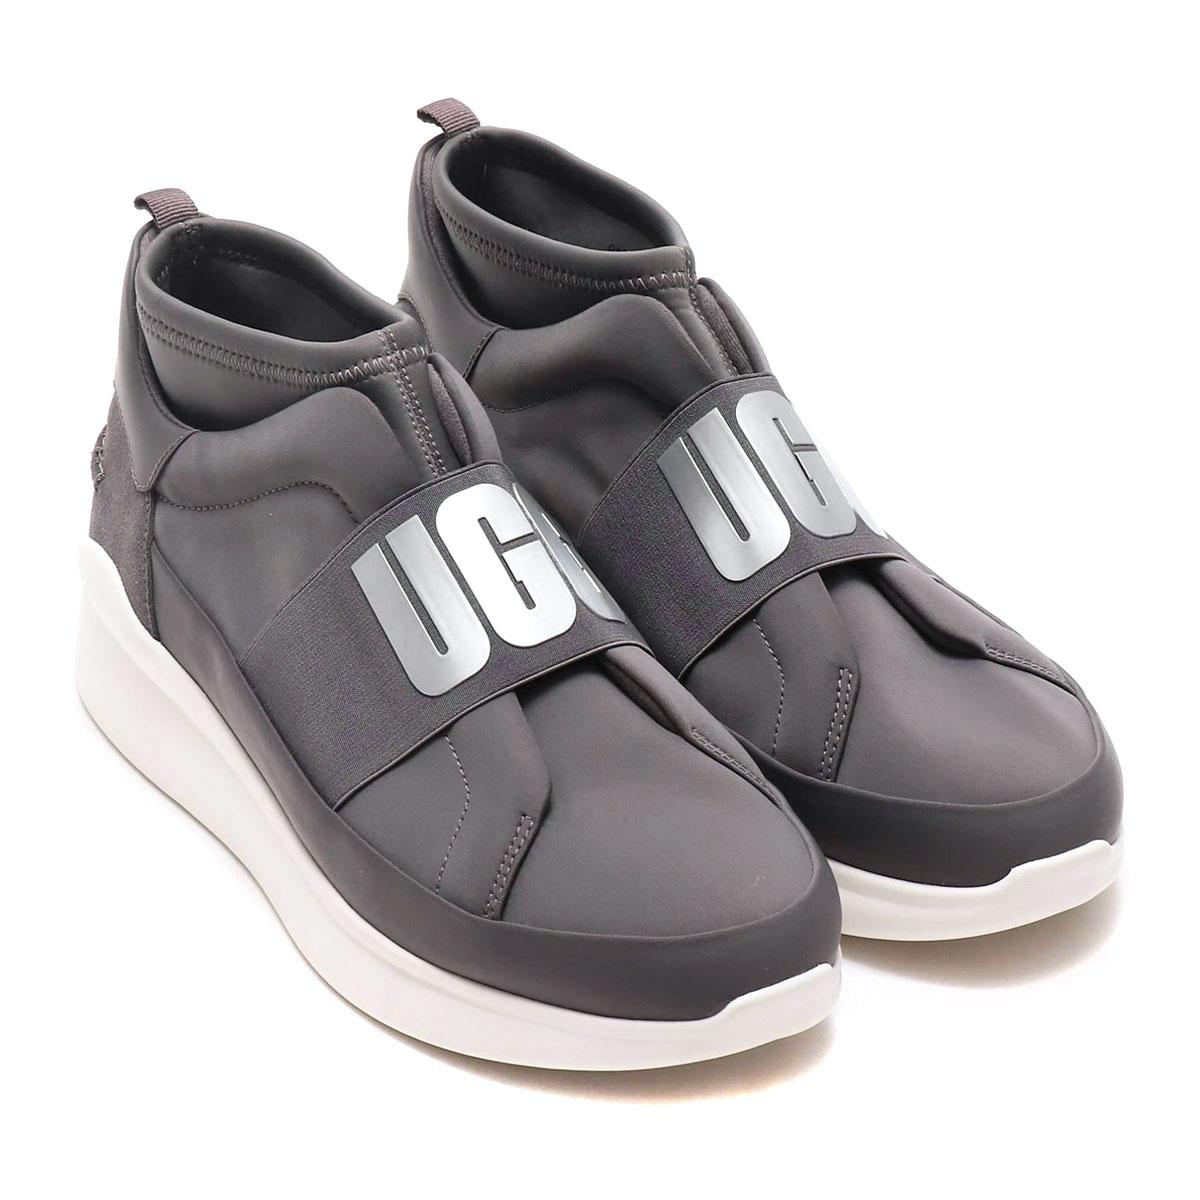 UGG Neutra Sneaker (アグ ニュートラ スニーカー)CHARCOAL【レディース スニーカー】19SS-I